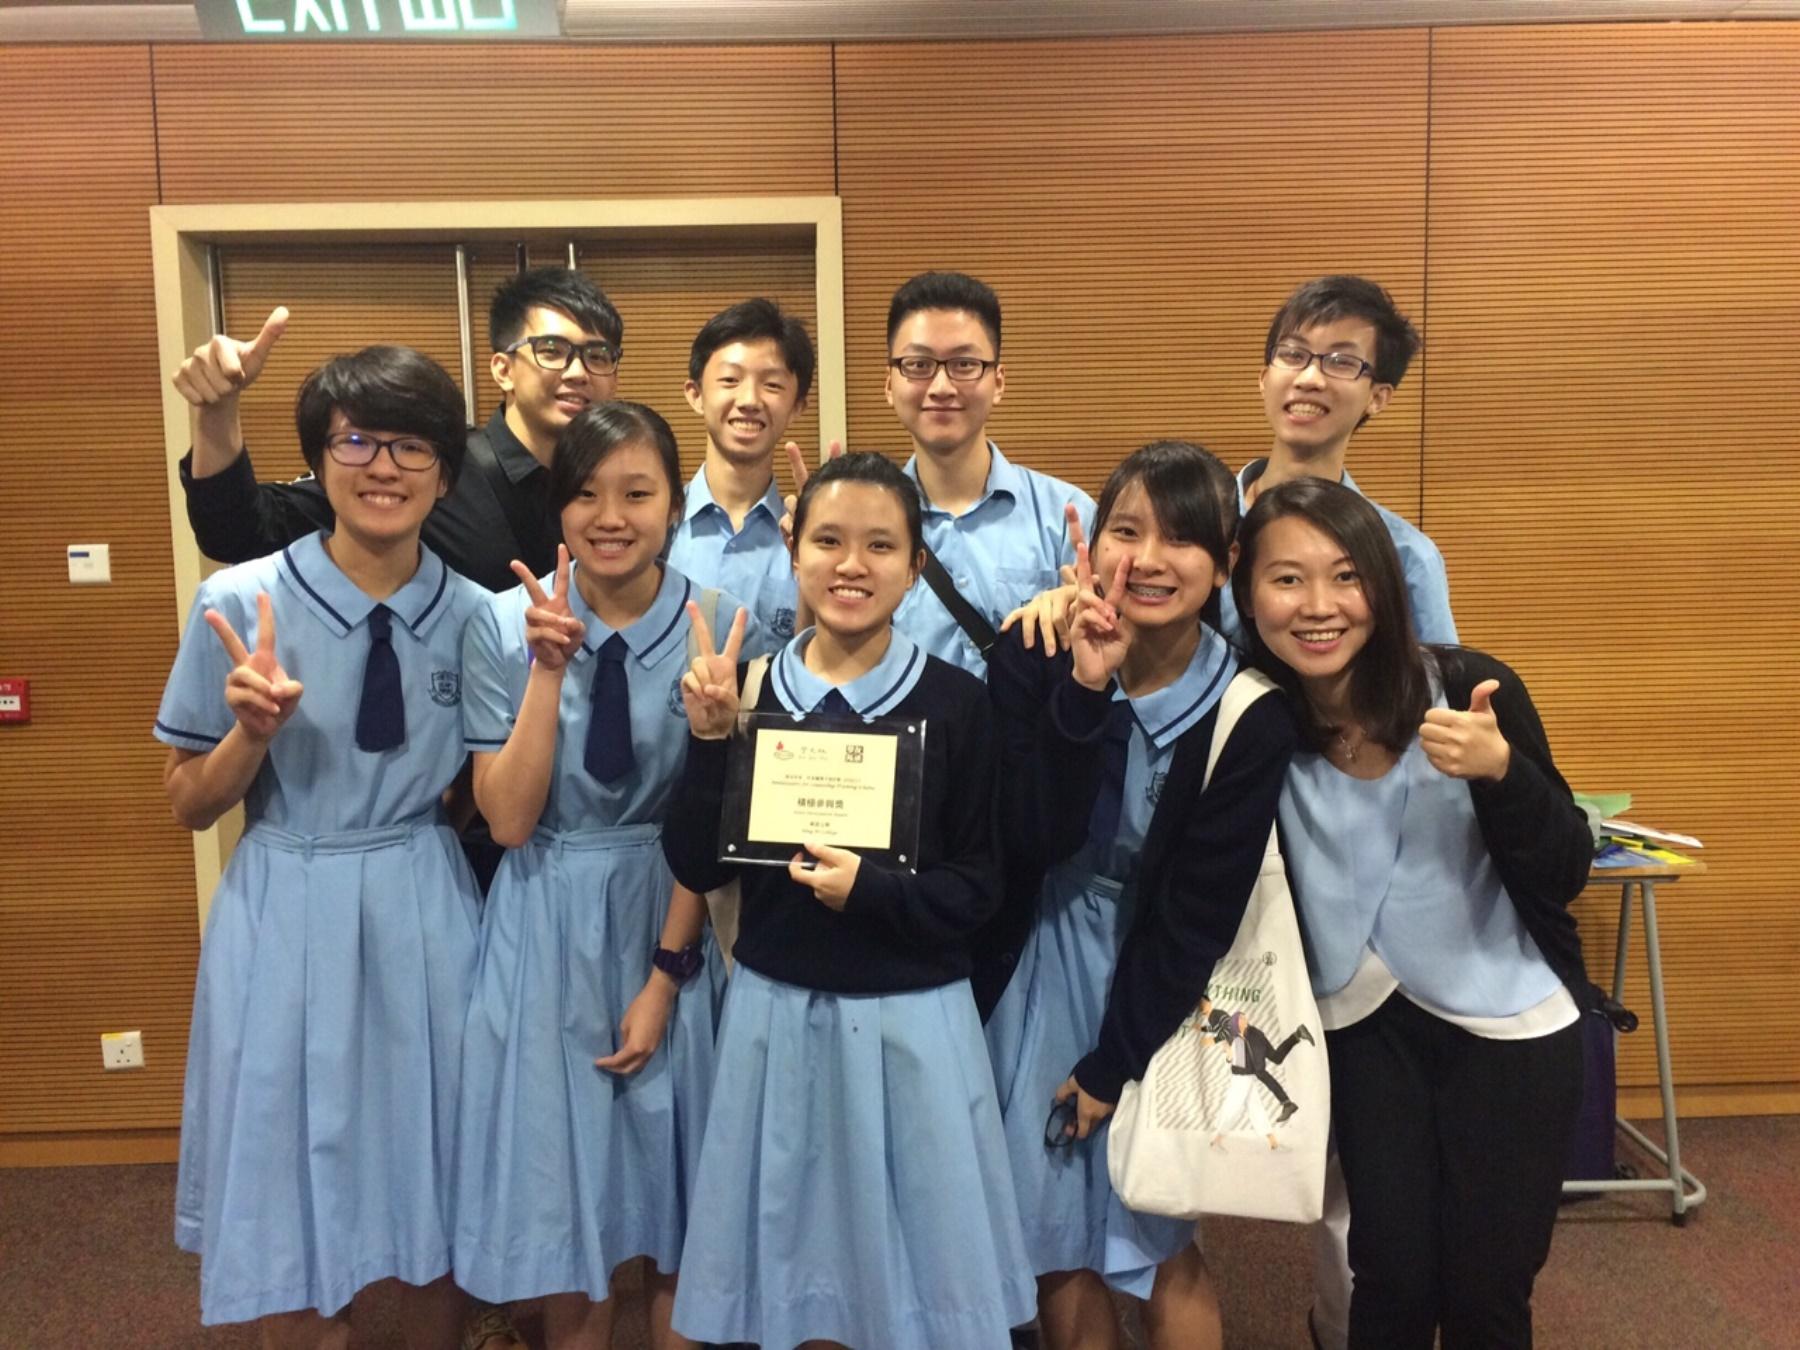 http://www.npc.edu.hk/sites/default/files/img_5946.jpg